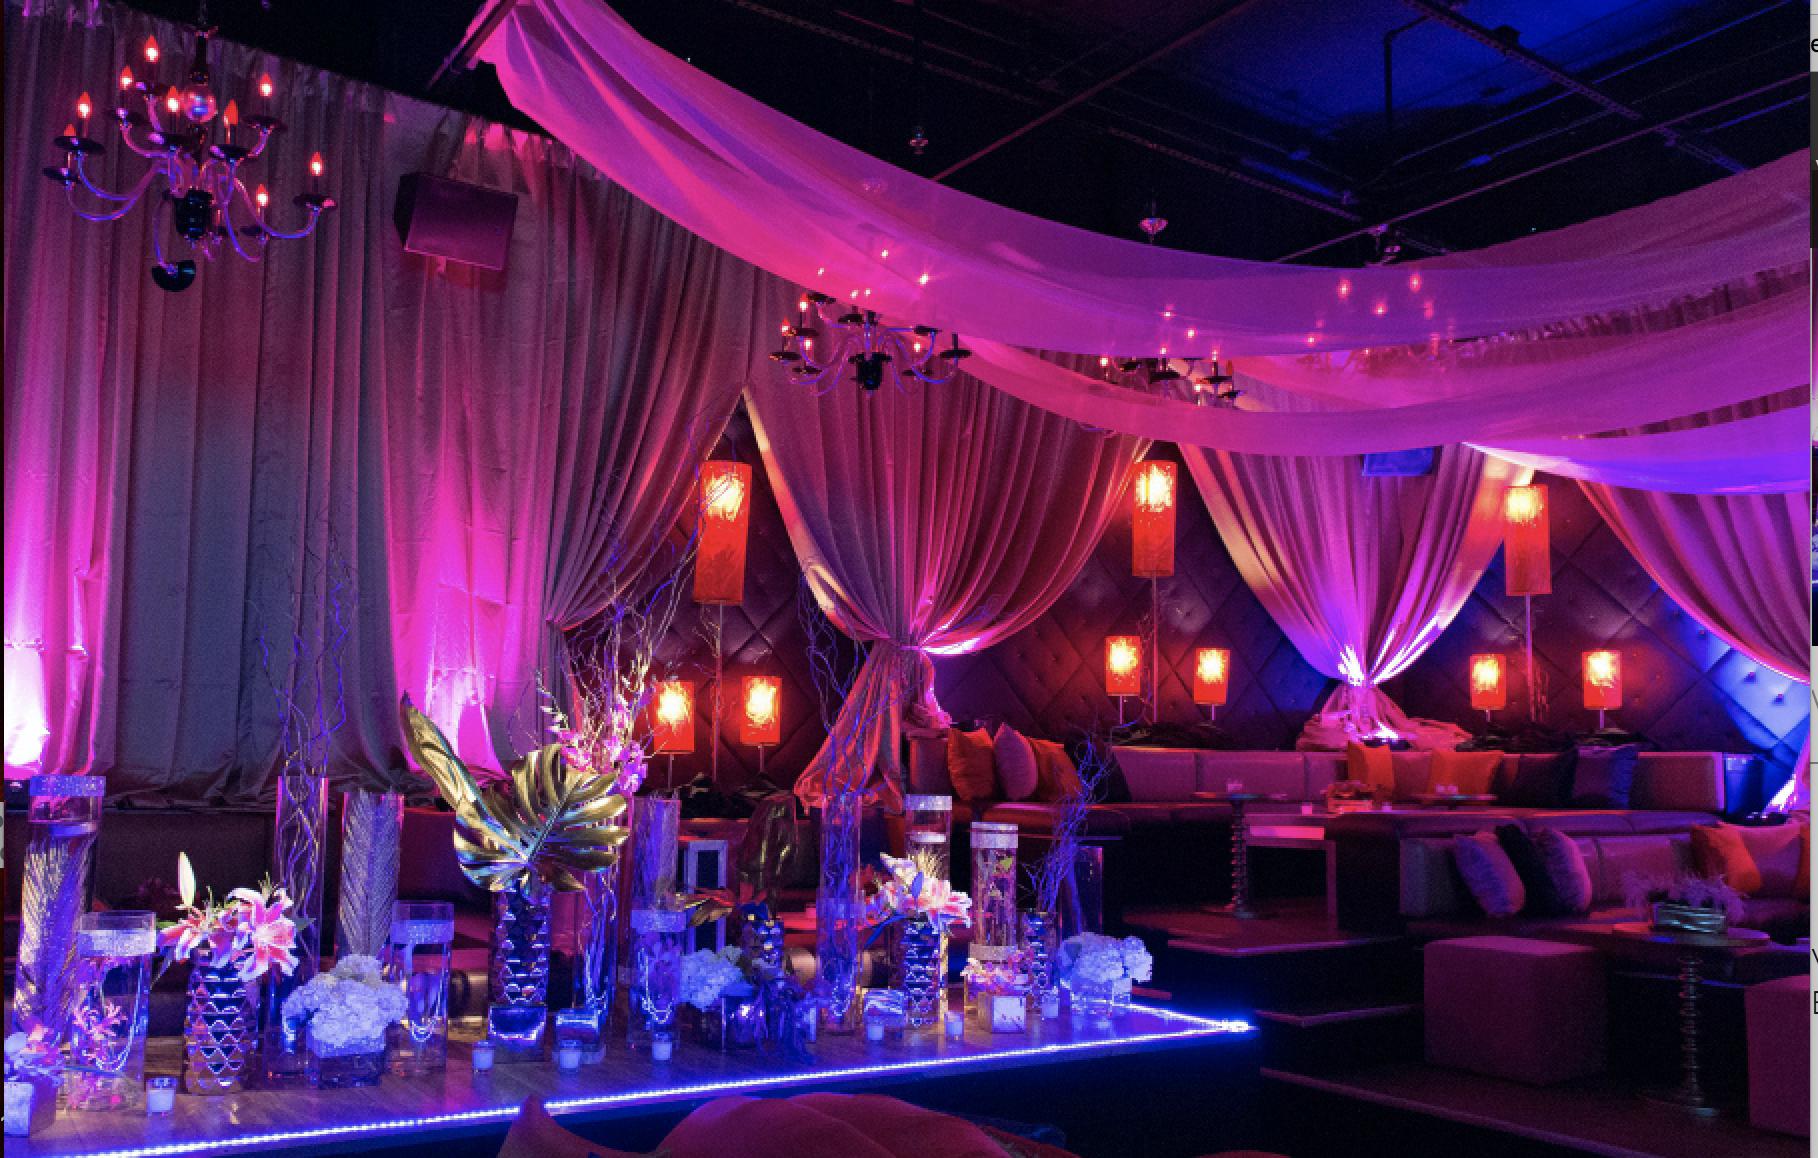 Mosaic-Nightclub-And-Lounge-Corporate-Draping-1.jpg